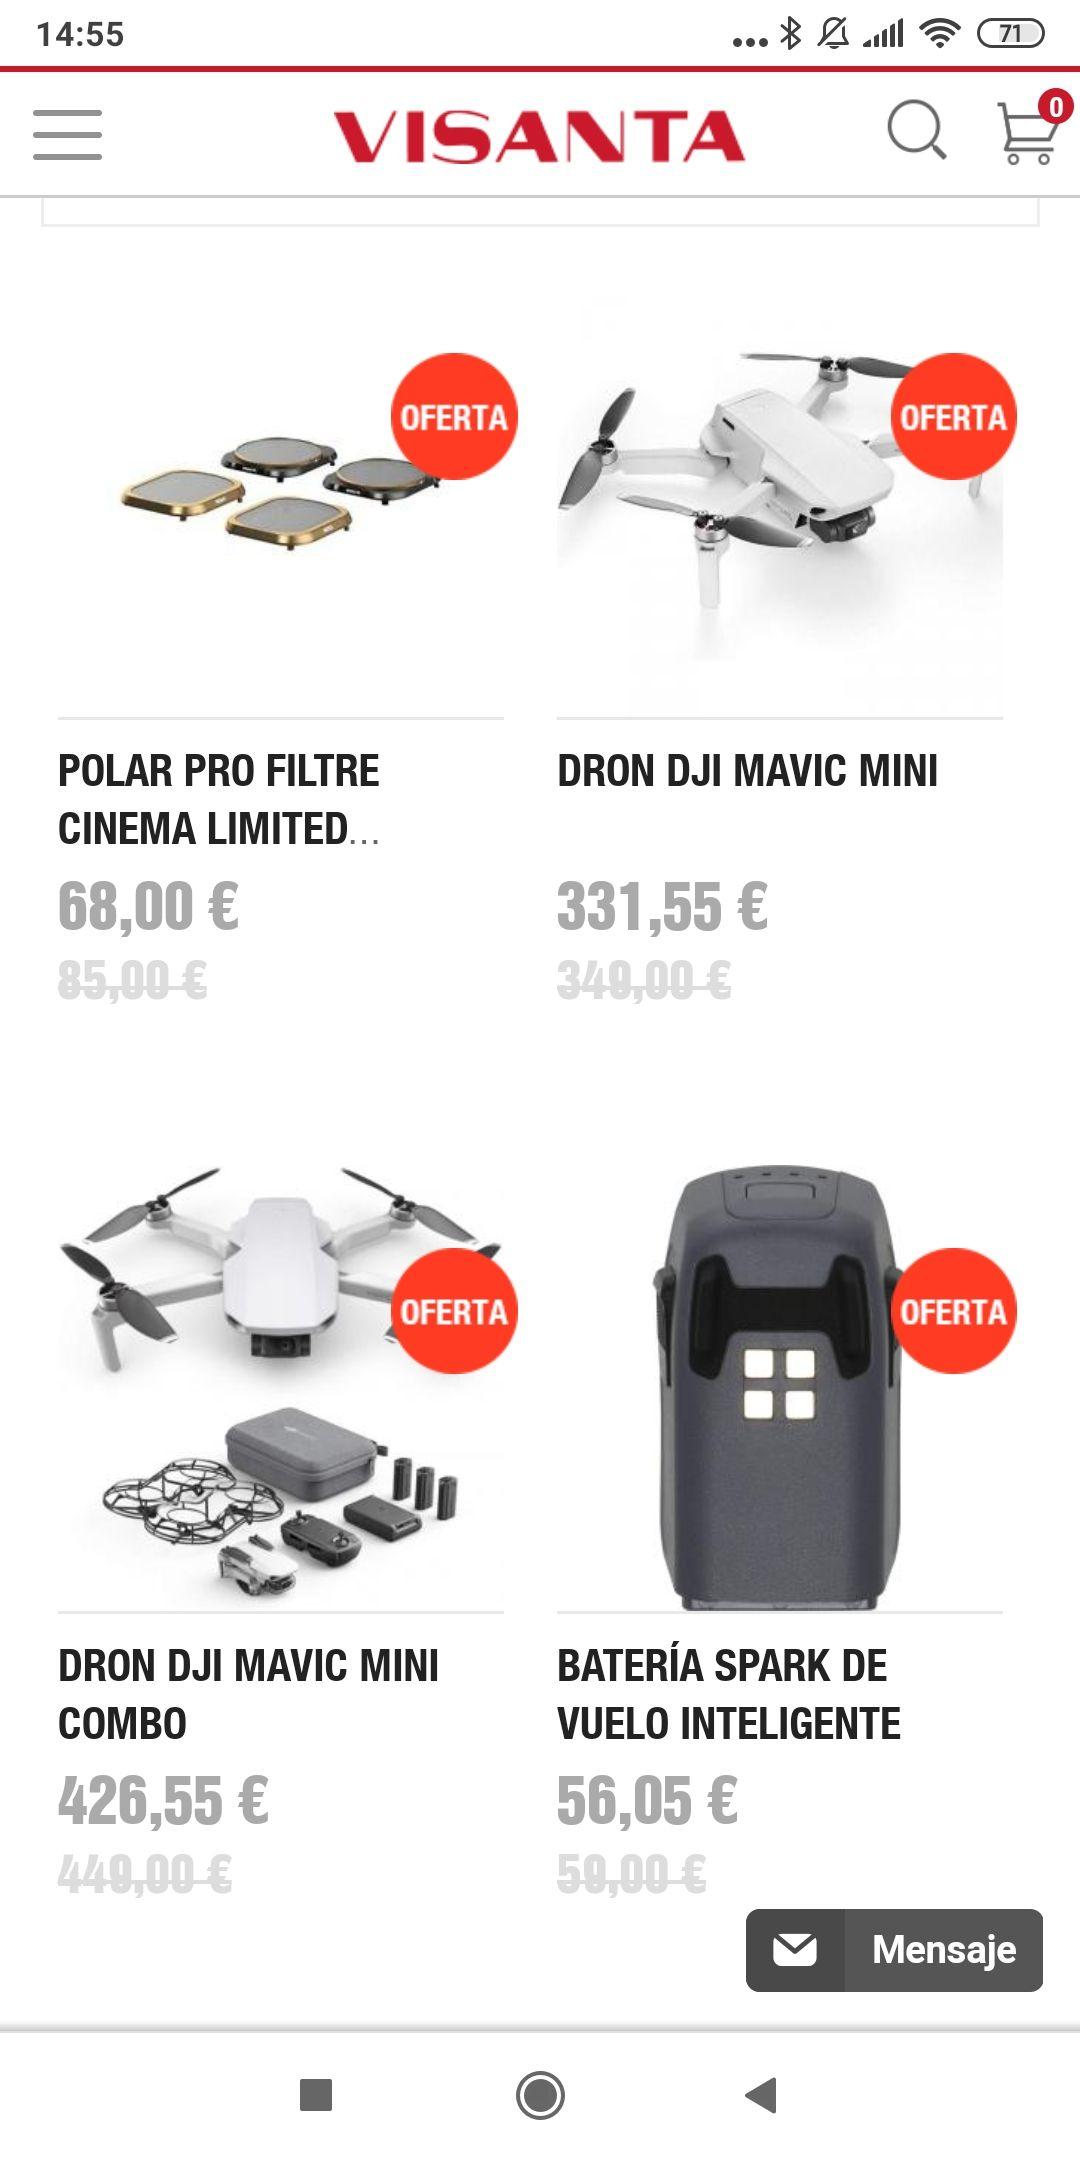 Mavic mini Combo 426,55